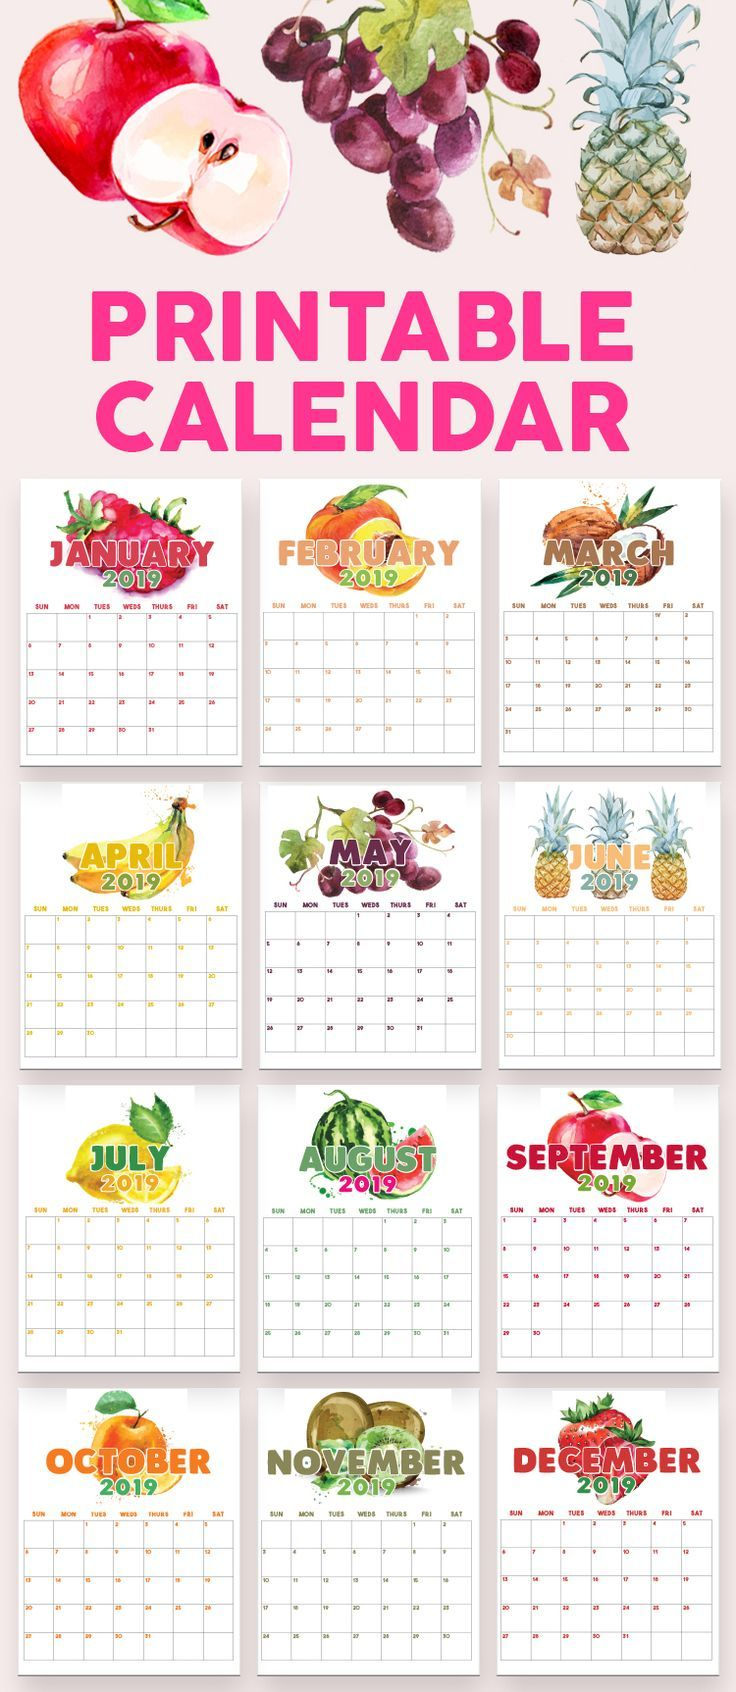 2020 Printable Calendars And Planners | Calendar, Printables